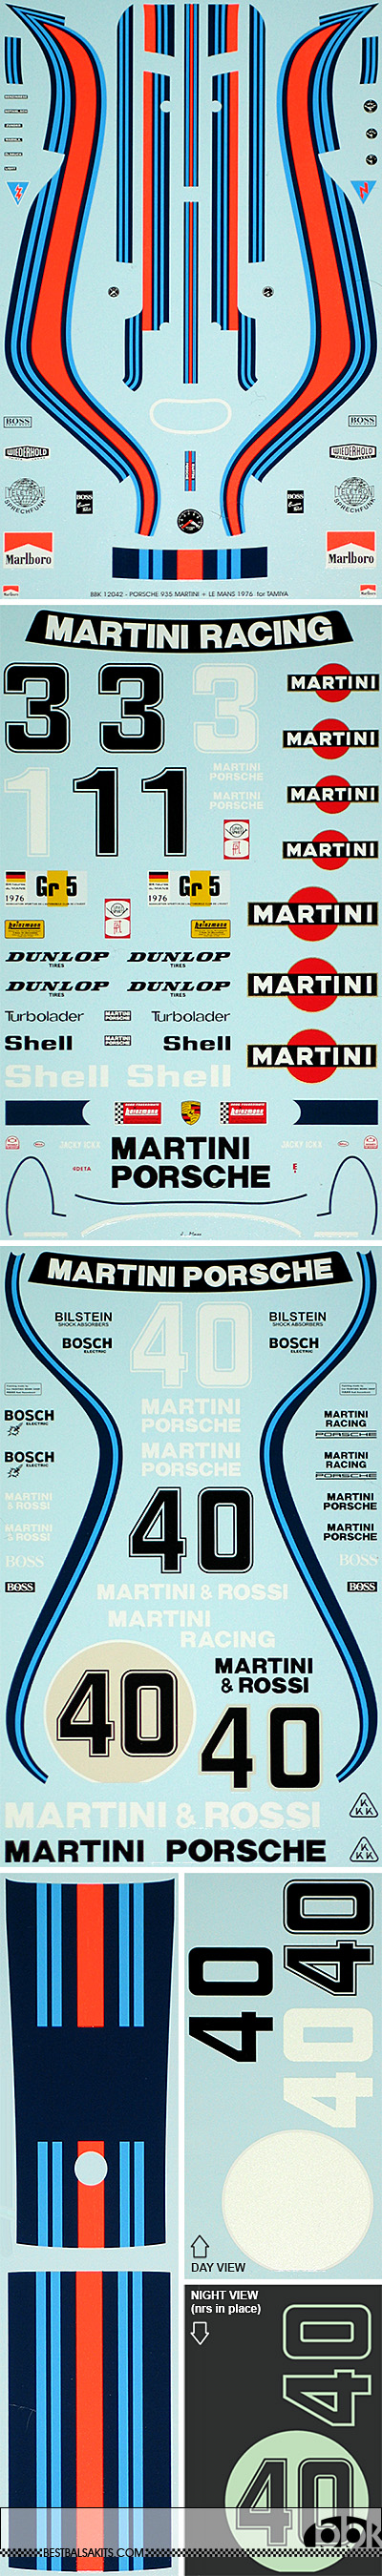 BBK 1/12 PORSCHE 935 MARTINI + LE MANS 1976 for TAMIYA